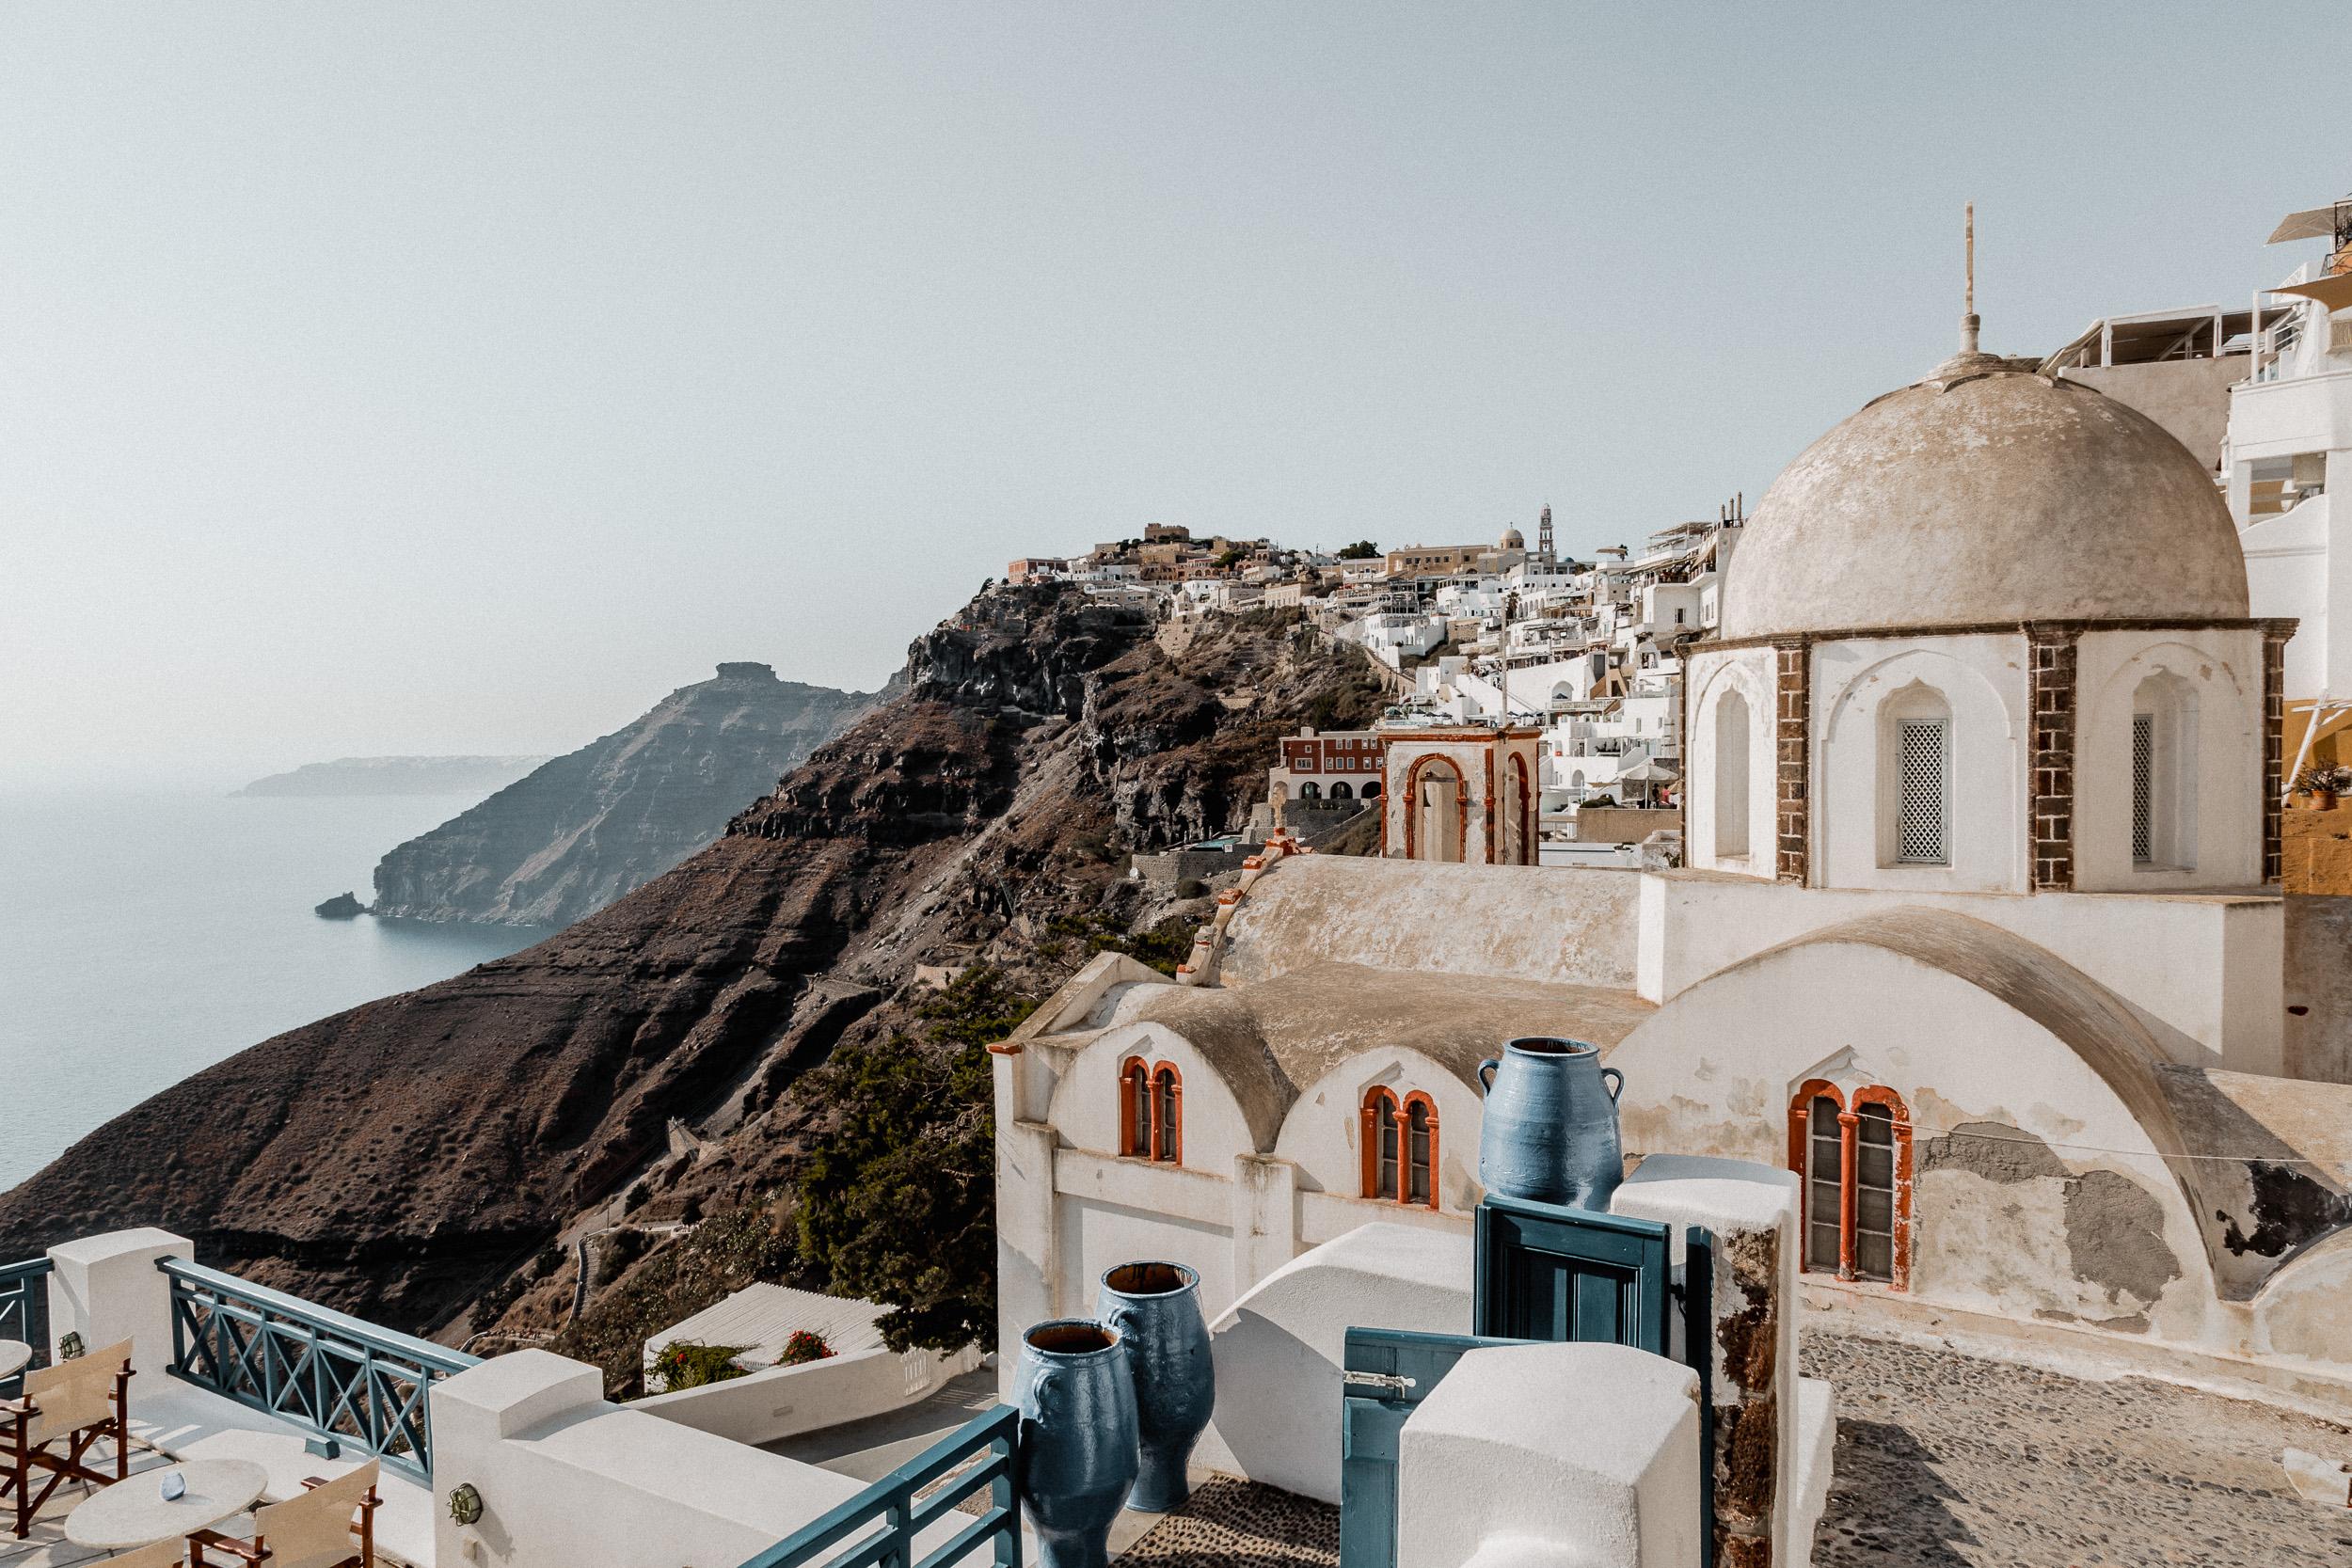 10-santorini-thira-greece-travel-cyclades-anna-elina-lahti-photographer.jpg